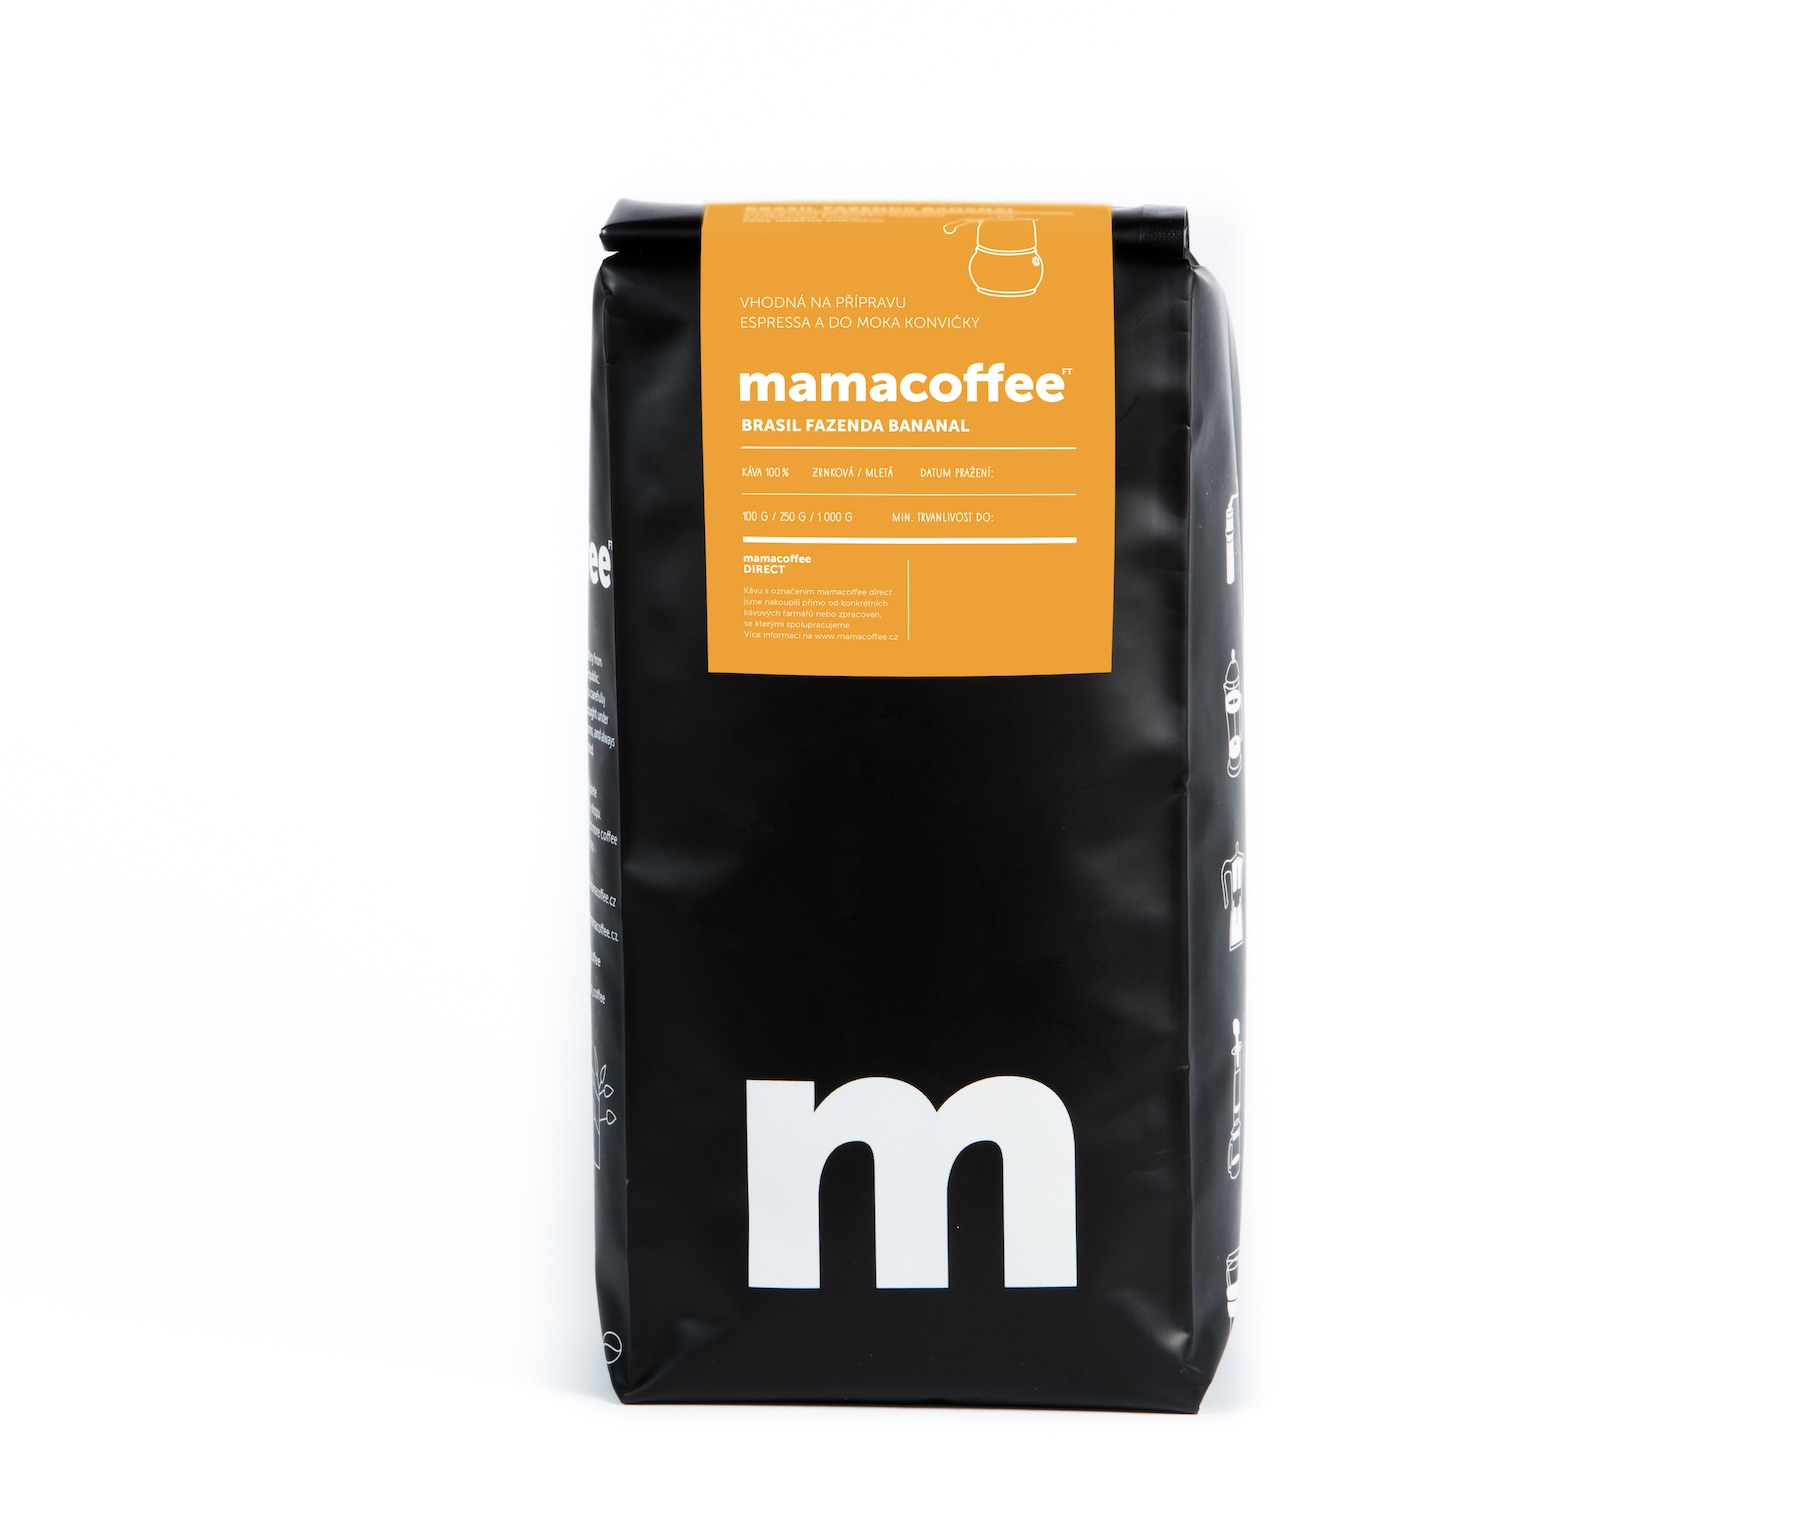 Mamacoffee - Brasil fazenda Bananal, 1000g Druh mletie: Mletá Expirace 11.8.2021